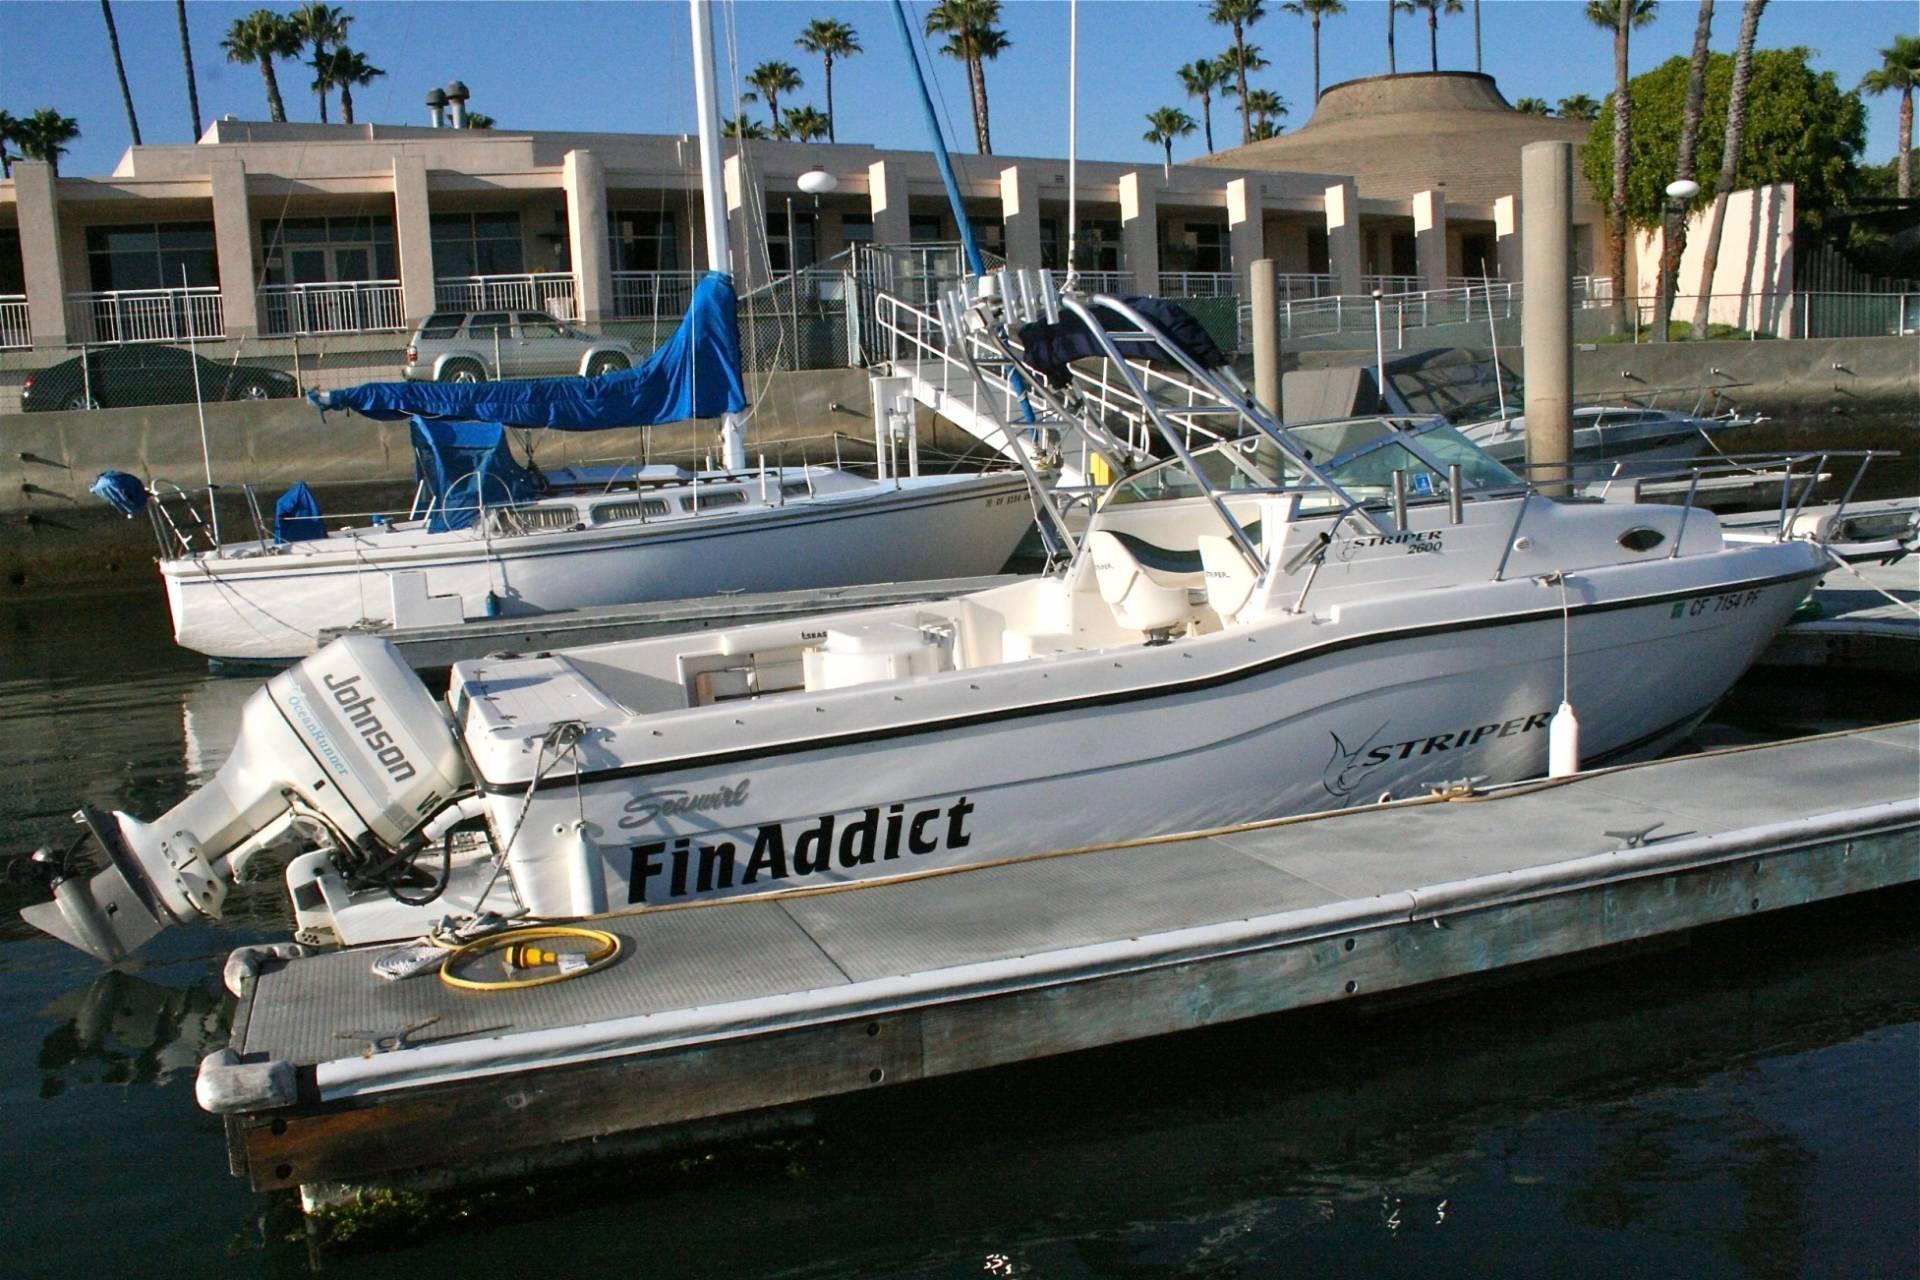 Johnson 225 hp ocean runner 2 stroke outboard motor for for Outboard motors for sale in delaware